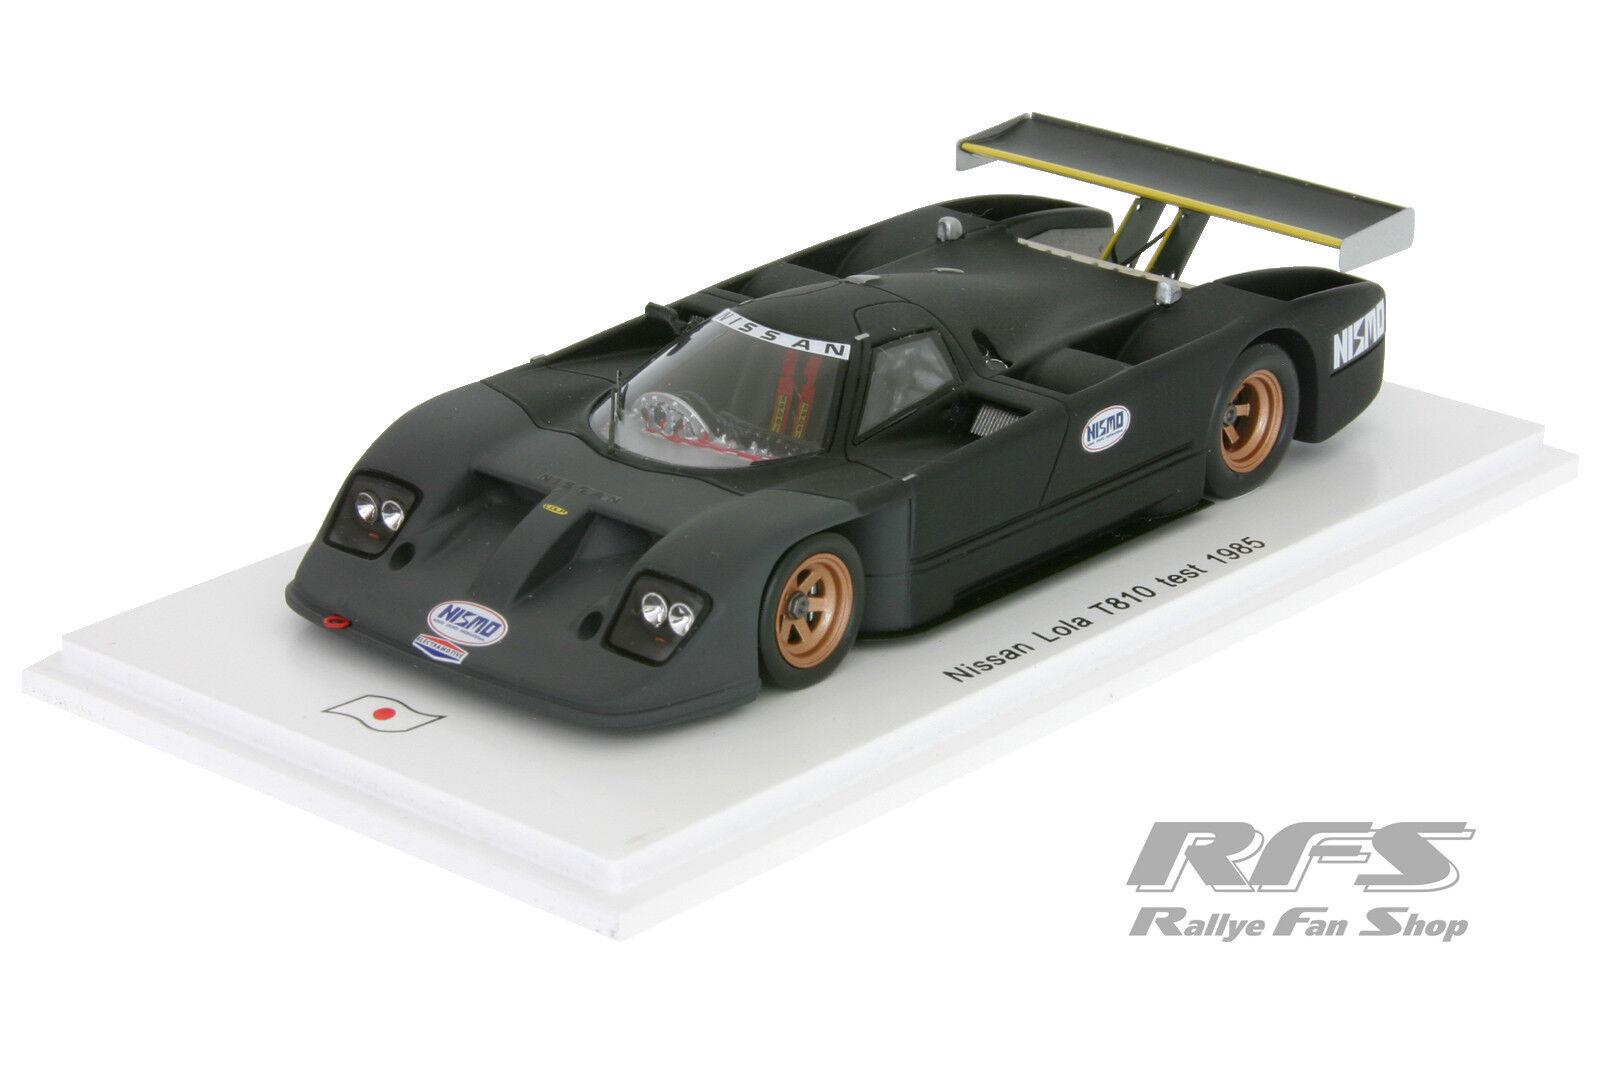 1 43 Nissan Lola t810 Test voiture-Team electramotive-IMSA 1985 Spark  sj023  choix à bas prix